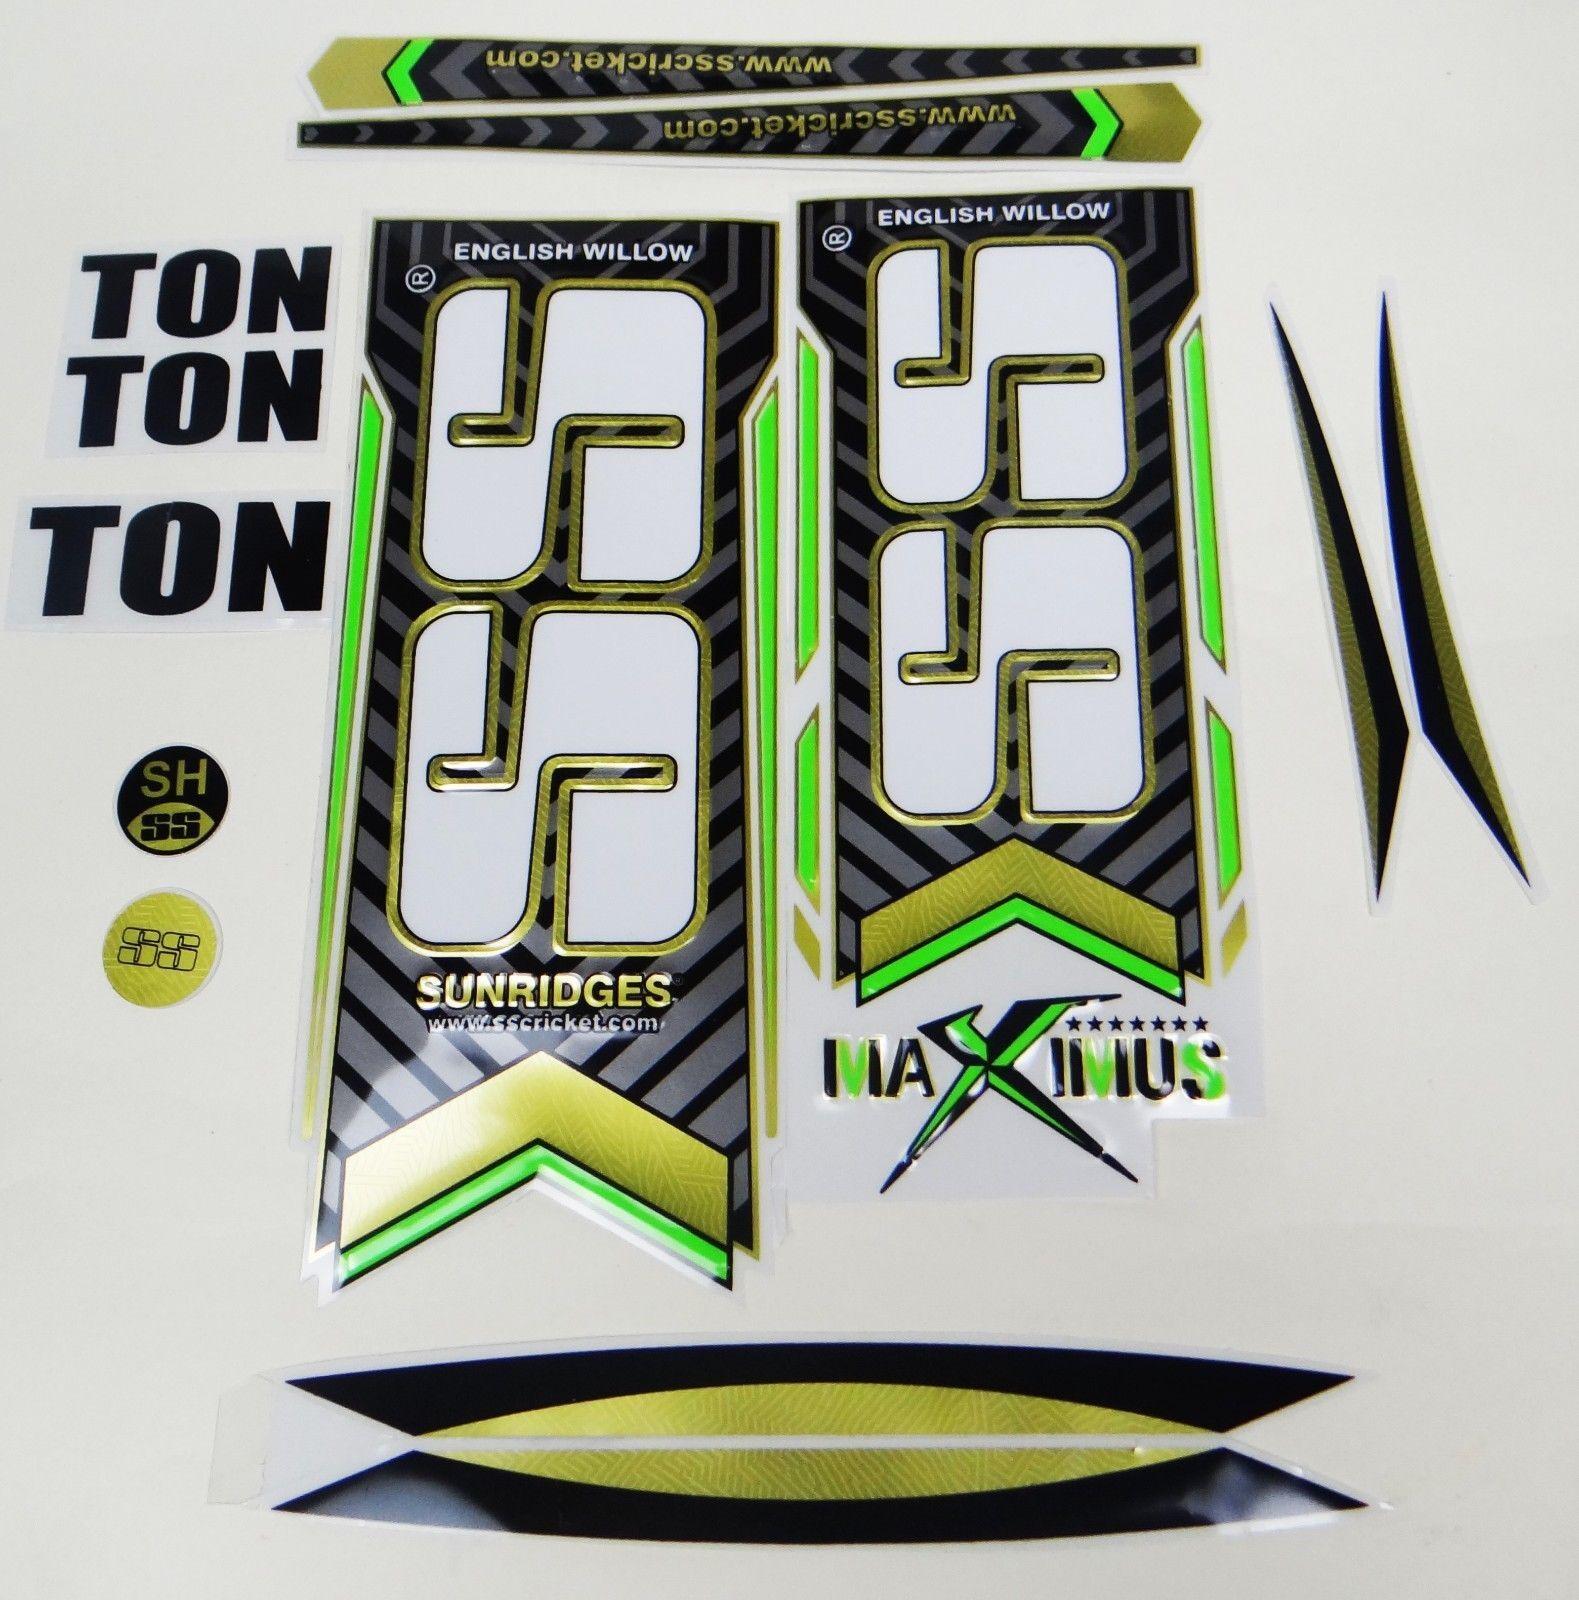 2 x Brand new 2019 model cricket bat stickers rare on  flouro yellow